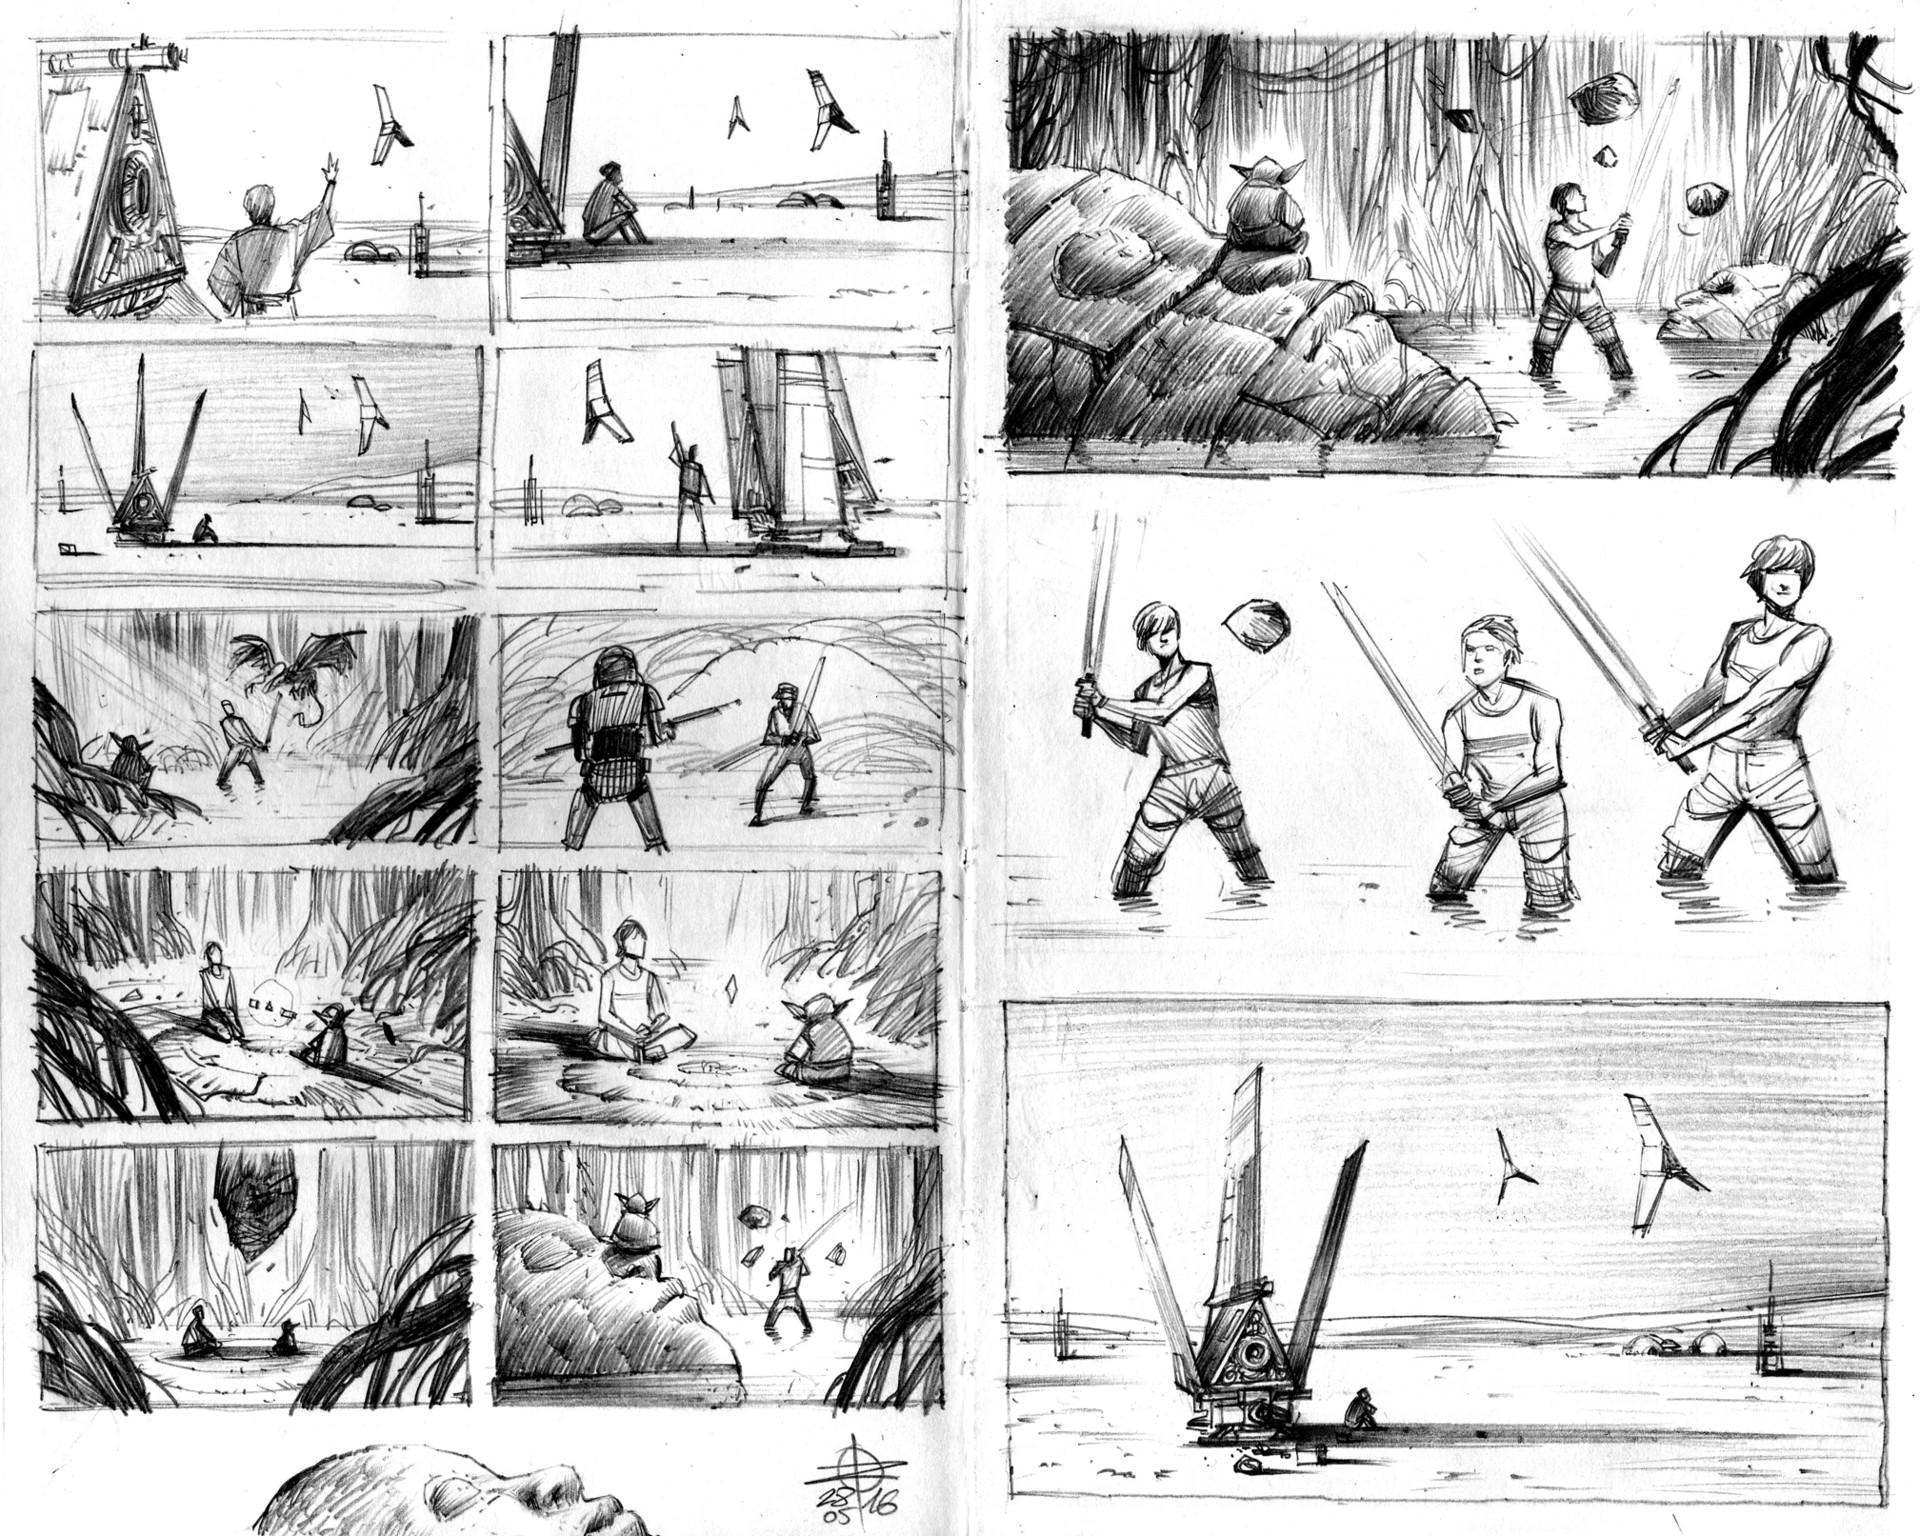 Renaud roche sketches03b